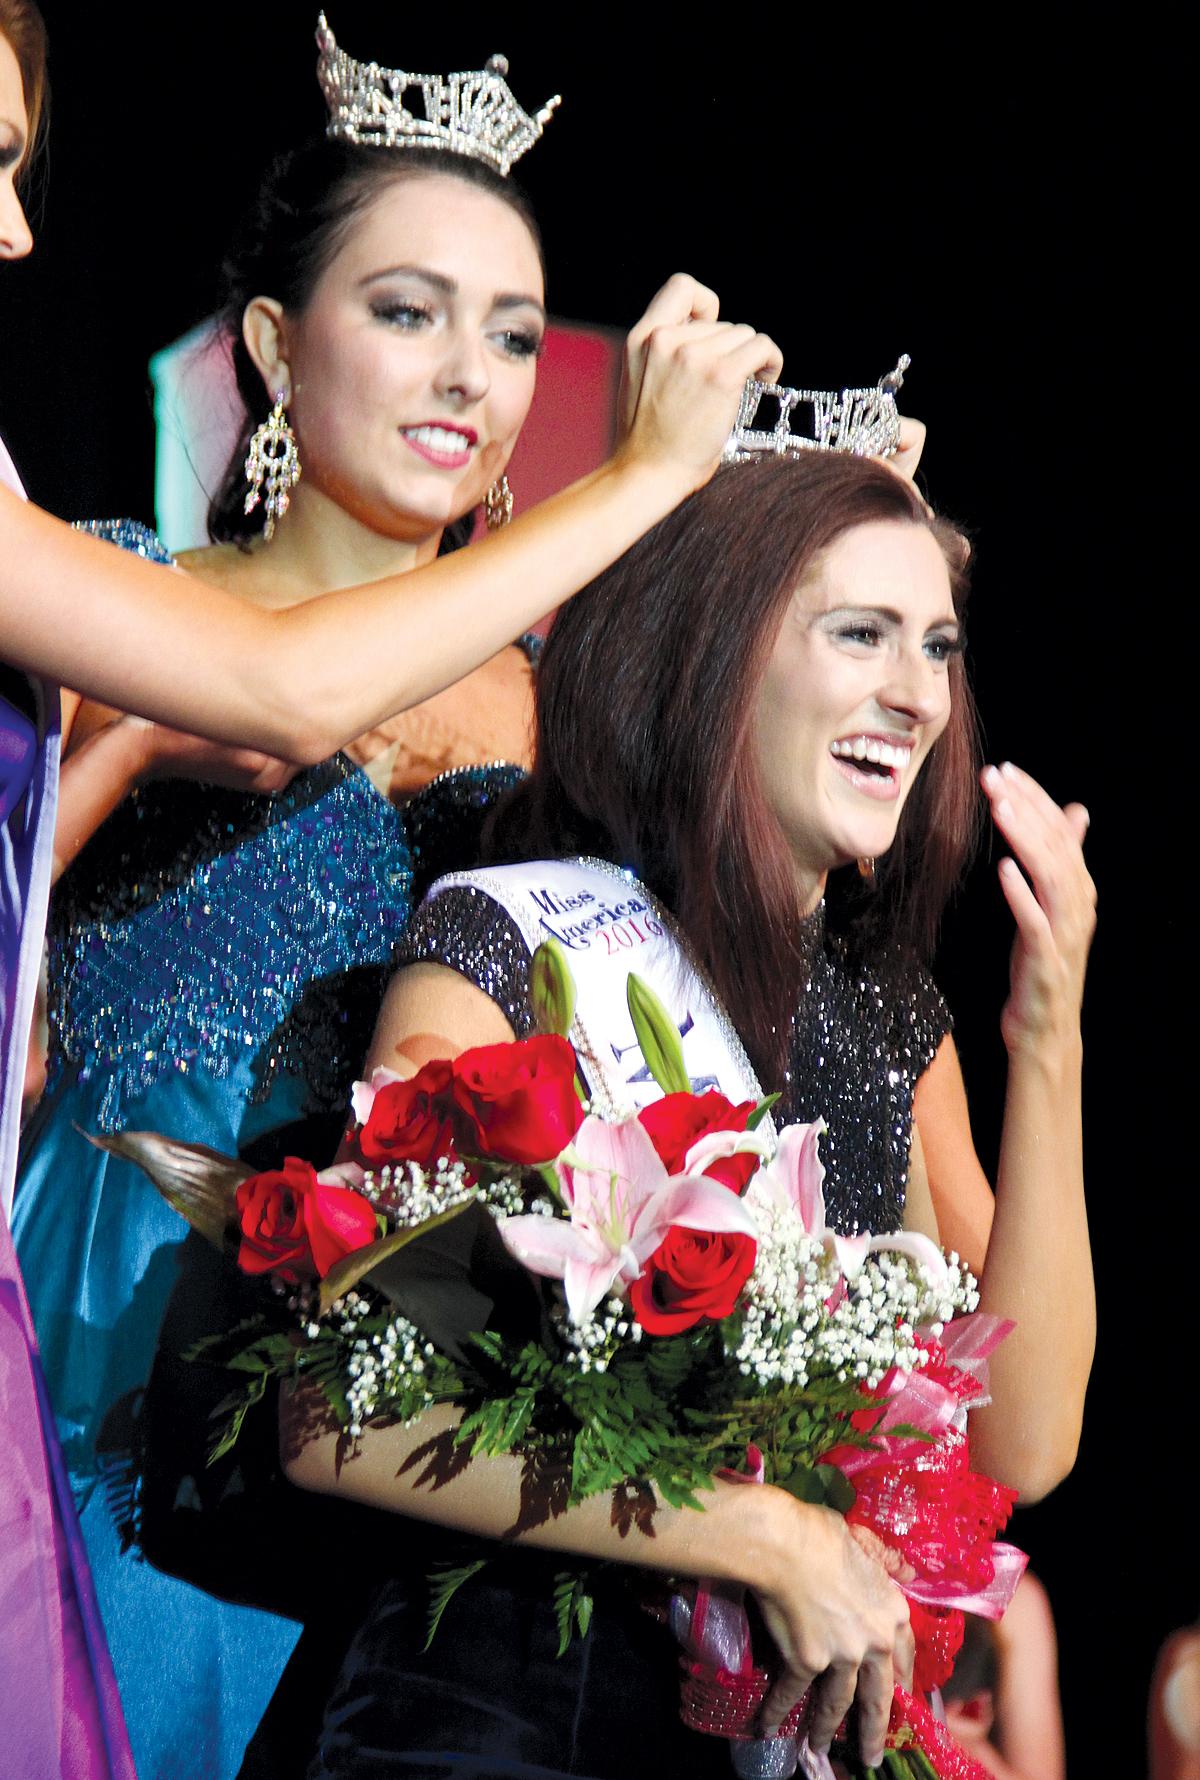 Miss Missouri 2016 Erin O'Flaherty on June 18, 2016.